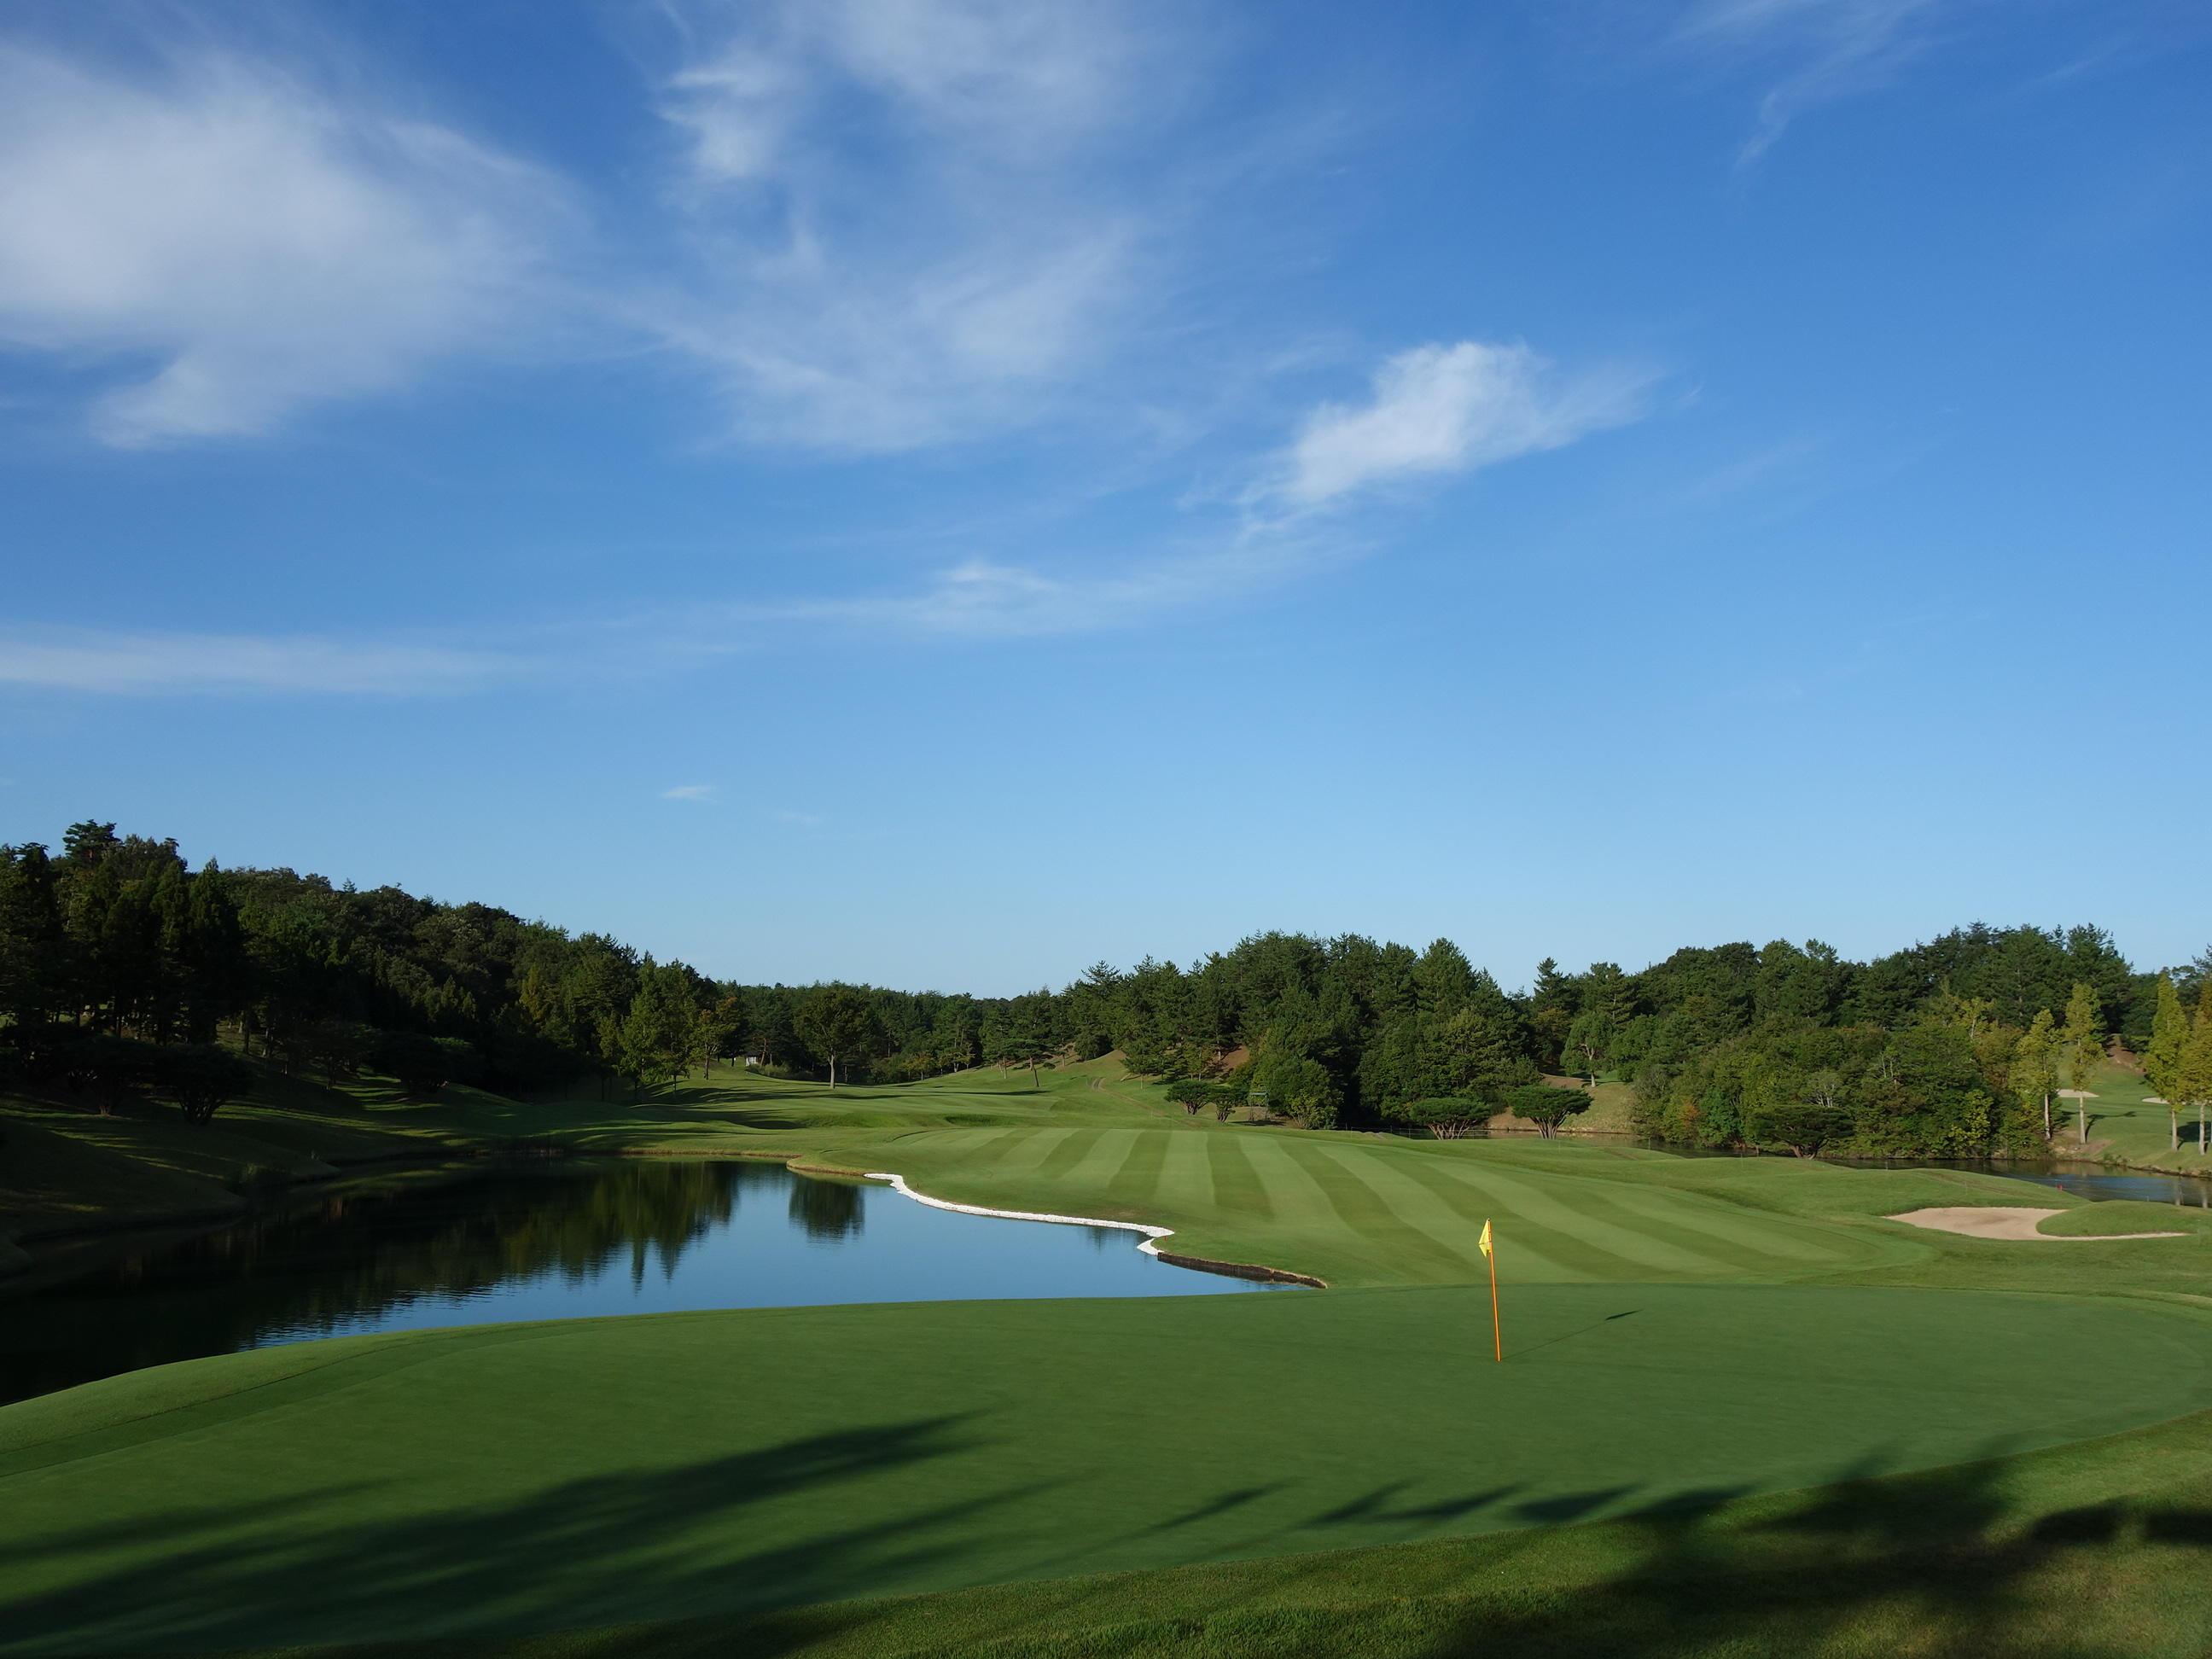 https://www.bs-golf.com/pro/9cccf15ab4375b0ca98c0d1d0bf9059d4f68ff40.JPG